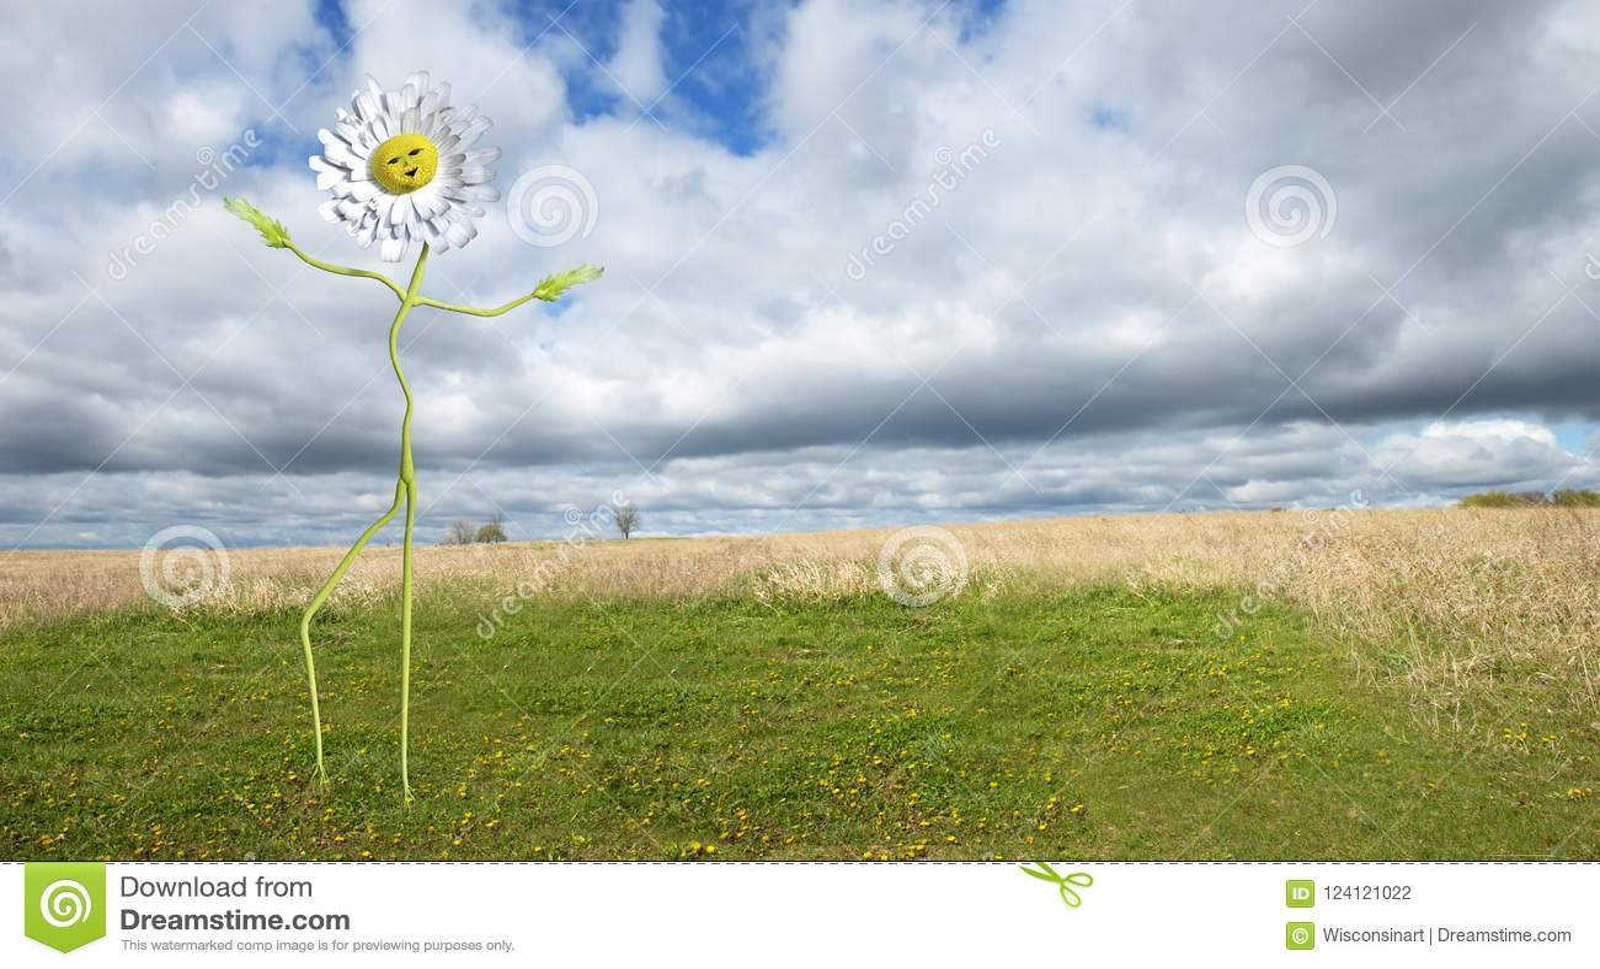 Funny dancing daisy flower background man stock photo image of download funny dancing daisy flower background man stock photo image of background wisconsinart izmirmasajfo